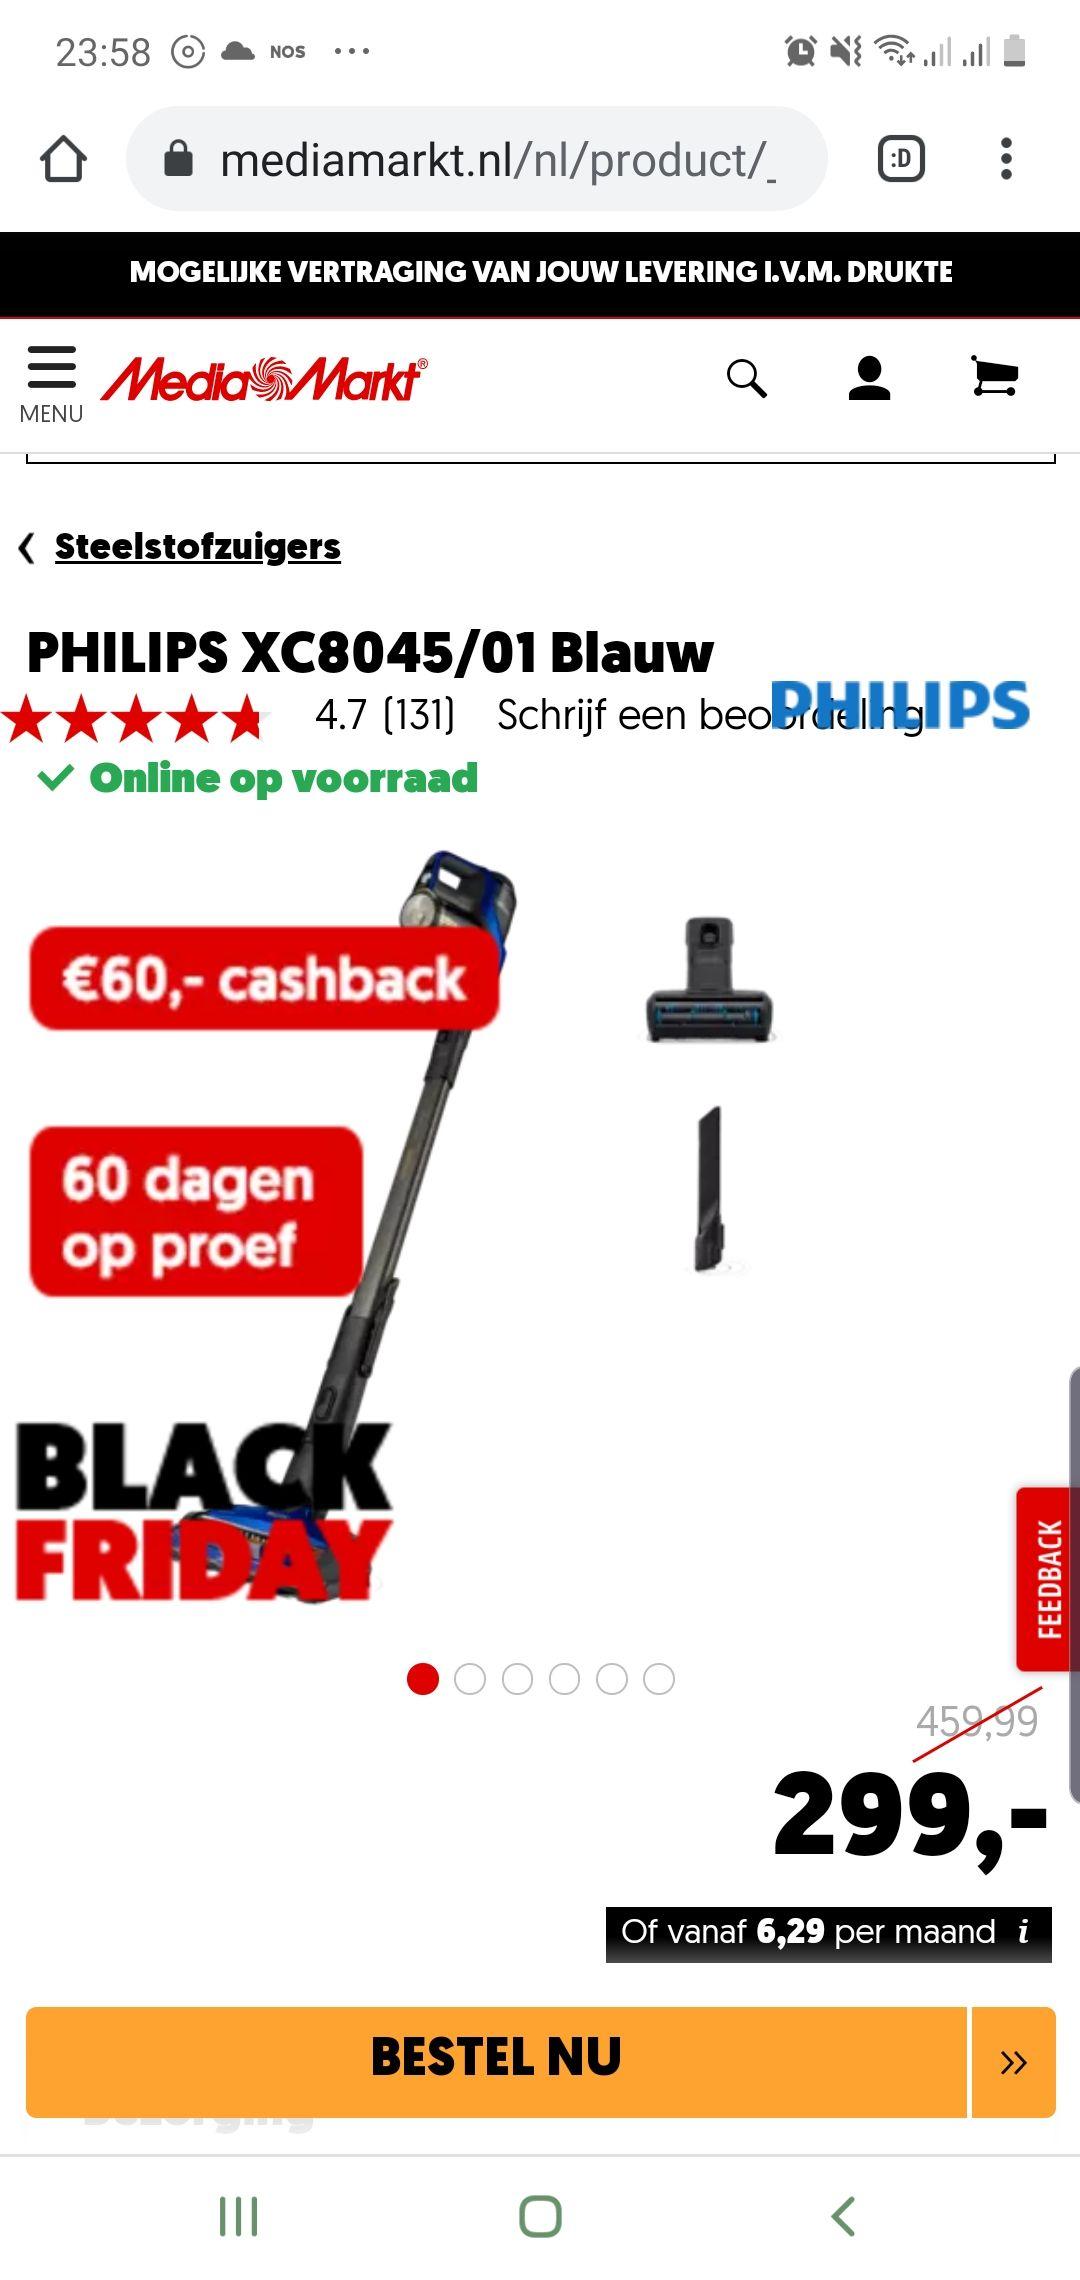 Philips speedpro xc8045 (steelstofzuiger)